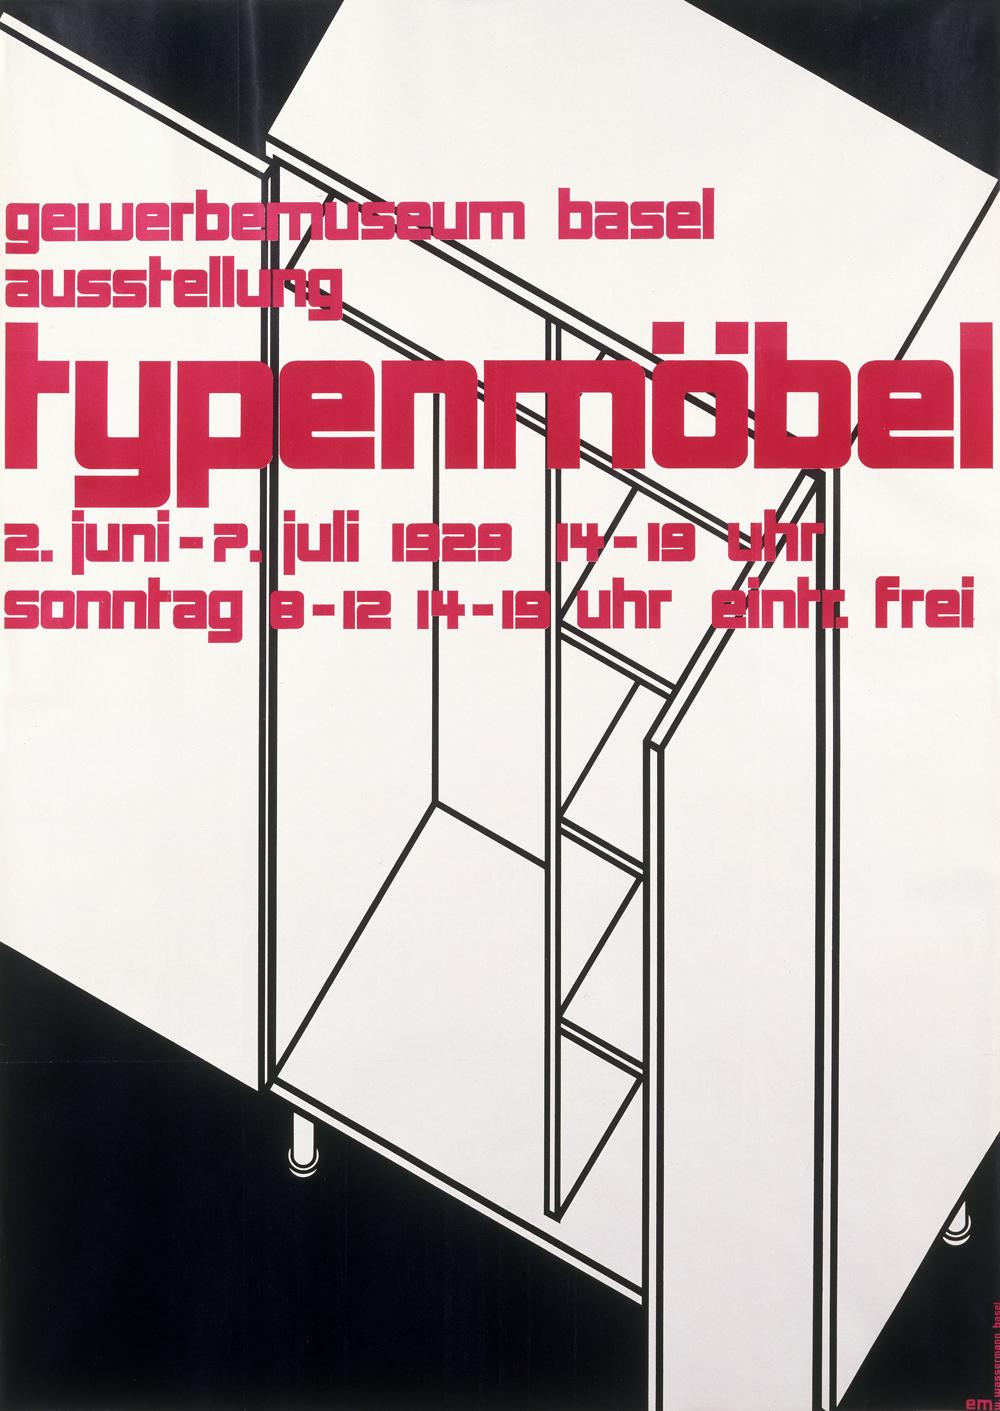 U0027Typenmöbelu0027, Poster, Ernst Mumenthaler (1901u20131978), Printed By W.  Wassermann, Switzerland, 1929, Colour Lithograph. Museum No. E.267u20132005